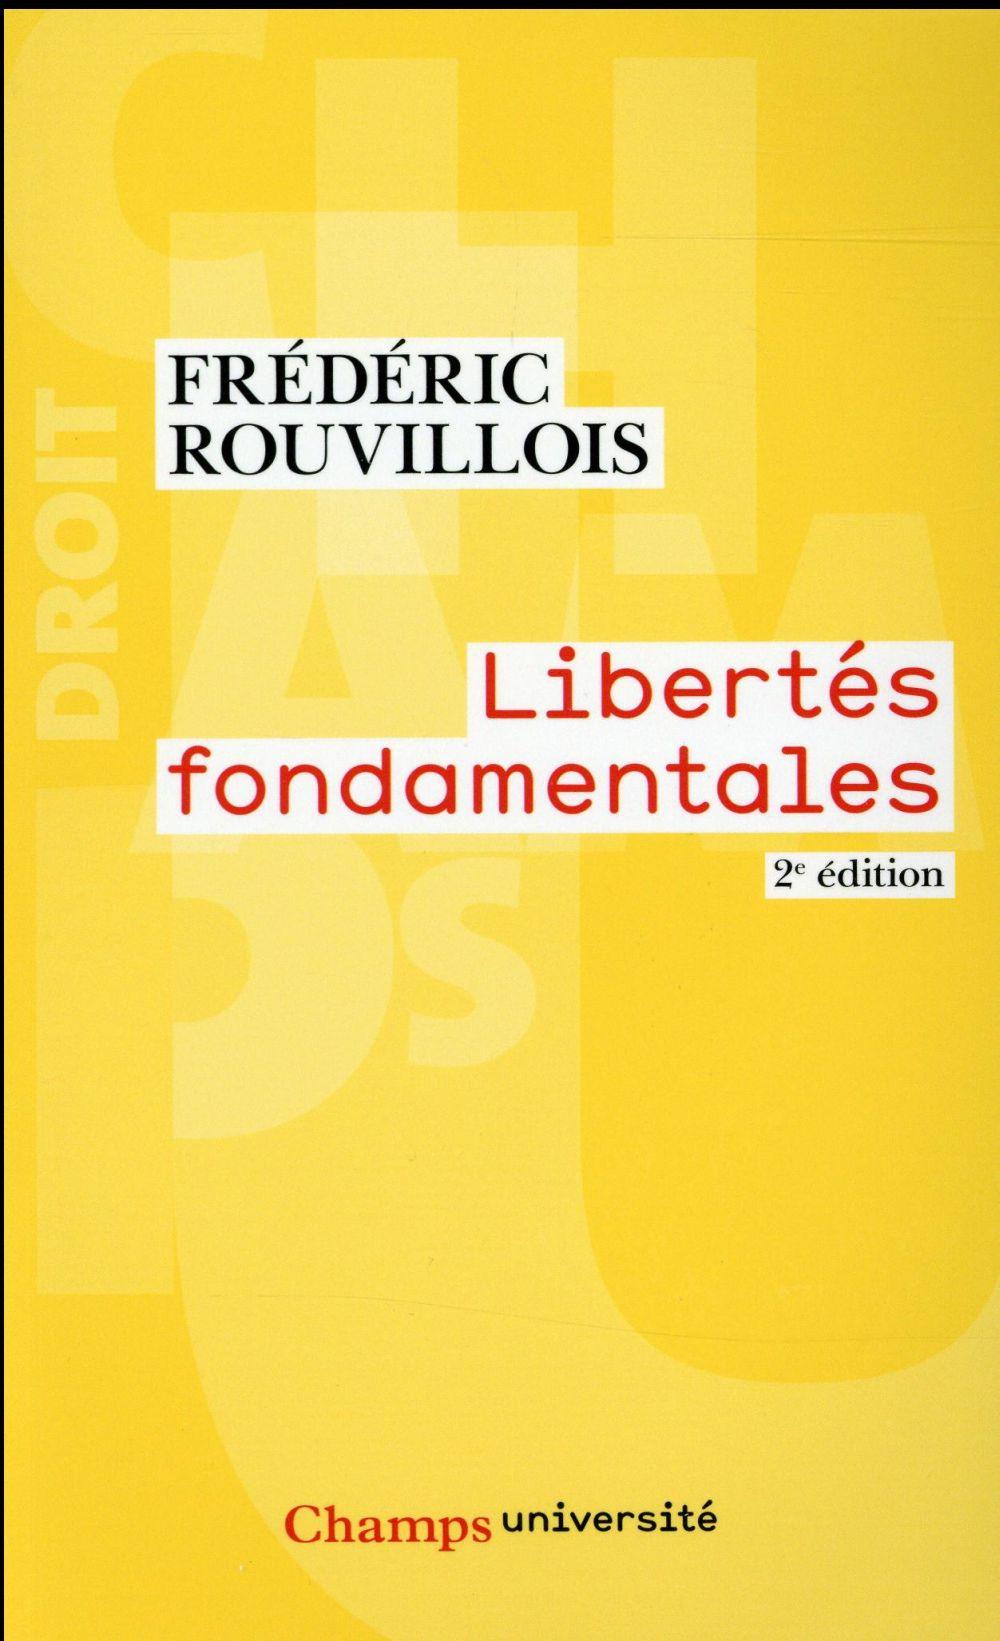 Libertés fondamentales (2e édition)